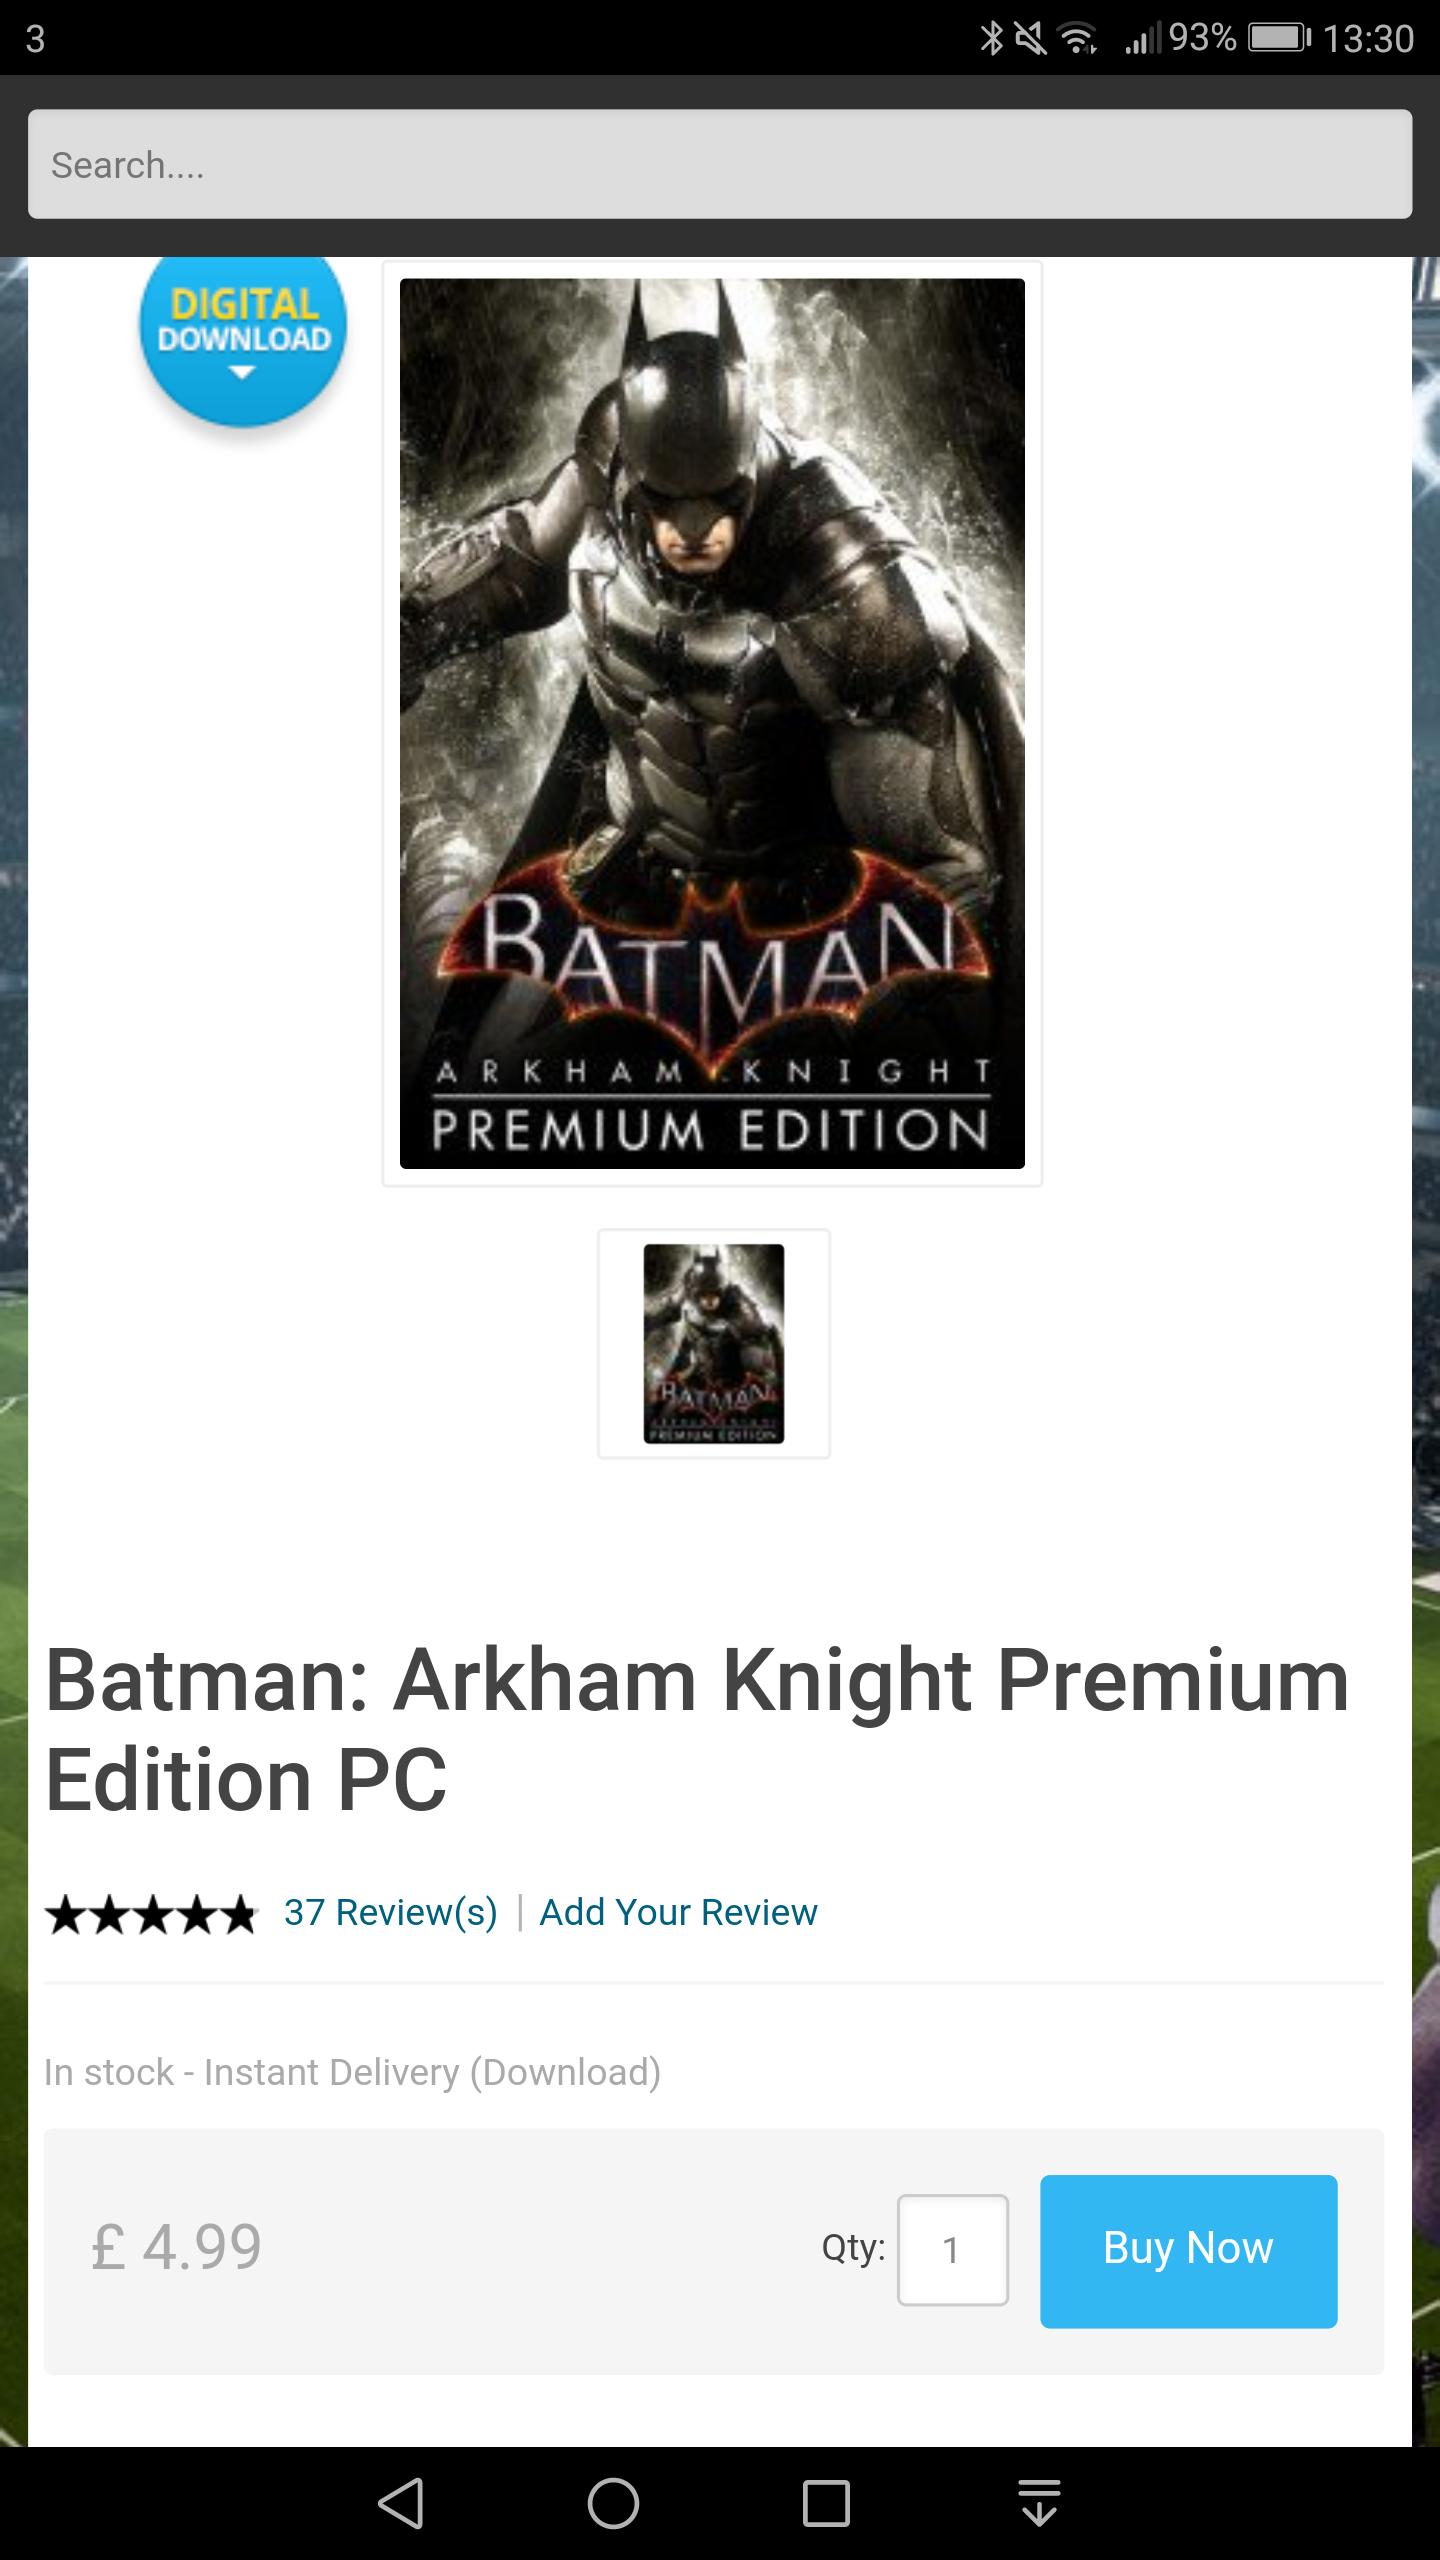 Batman Arkham Knight Premium Edition (includes Season Pass) - £4.99 at CDKeys (£4.74 with FB Like Discount) - Steam